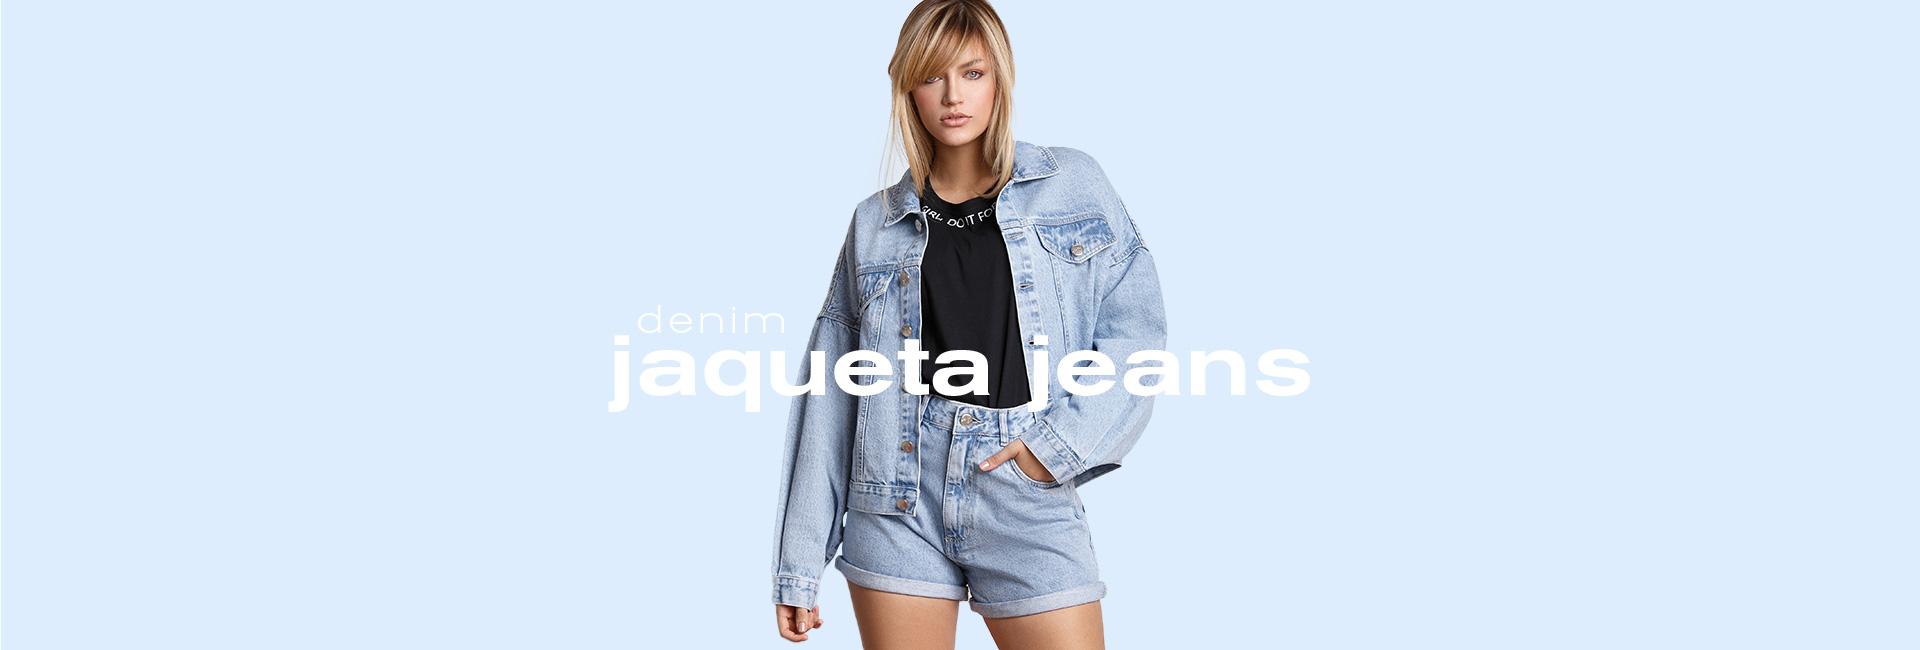 Jaqueta Jeans Clariá